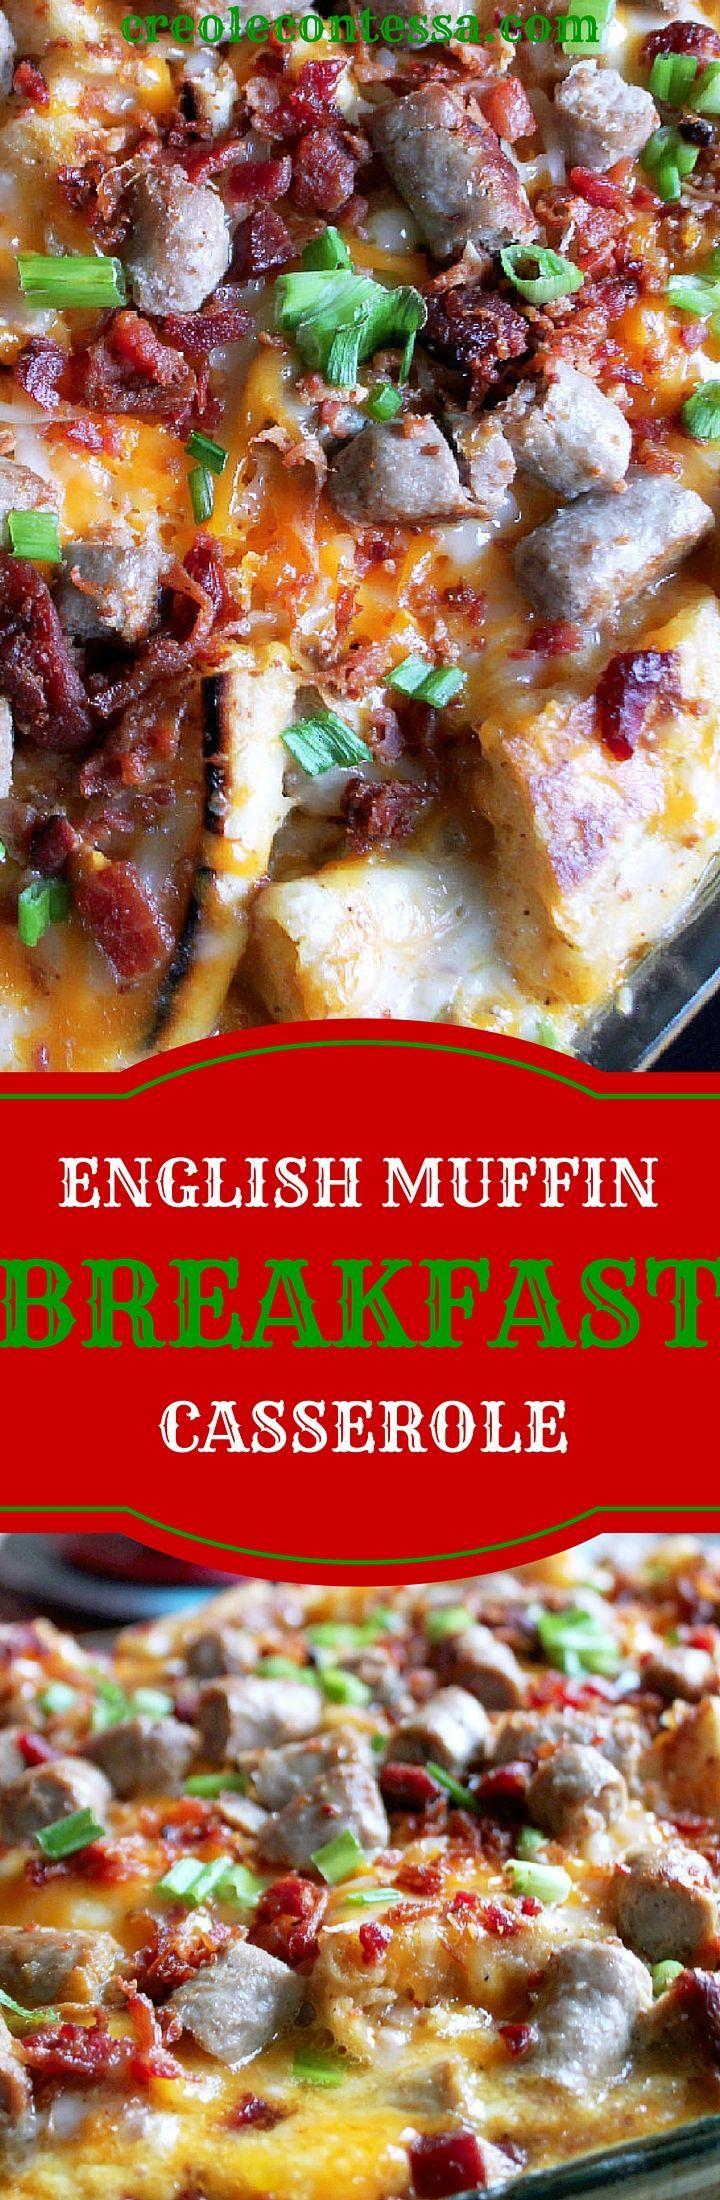 English Muffin Breakfast Casserole-Creole Contessa: